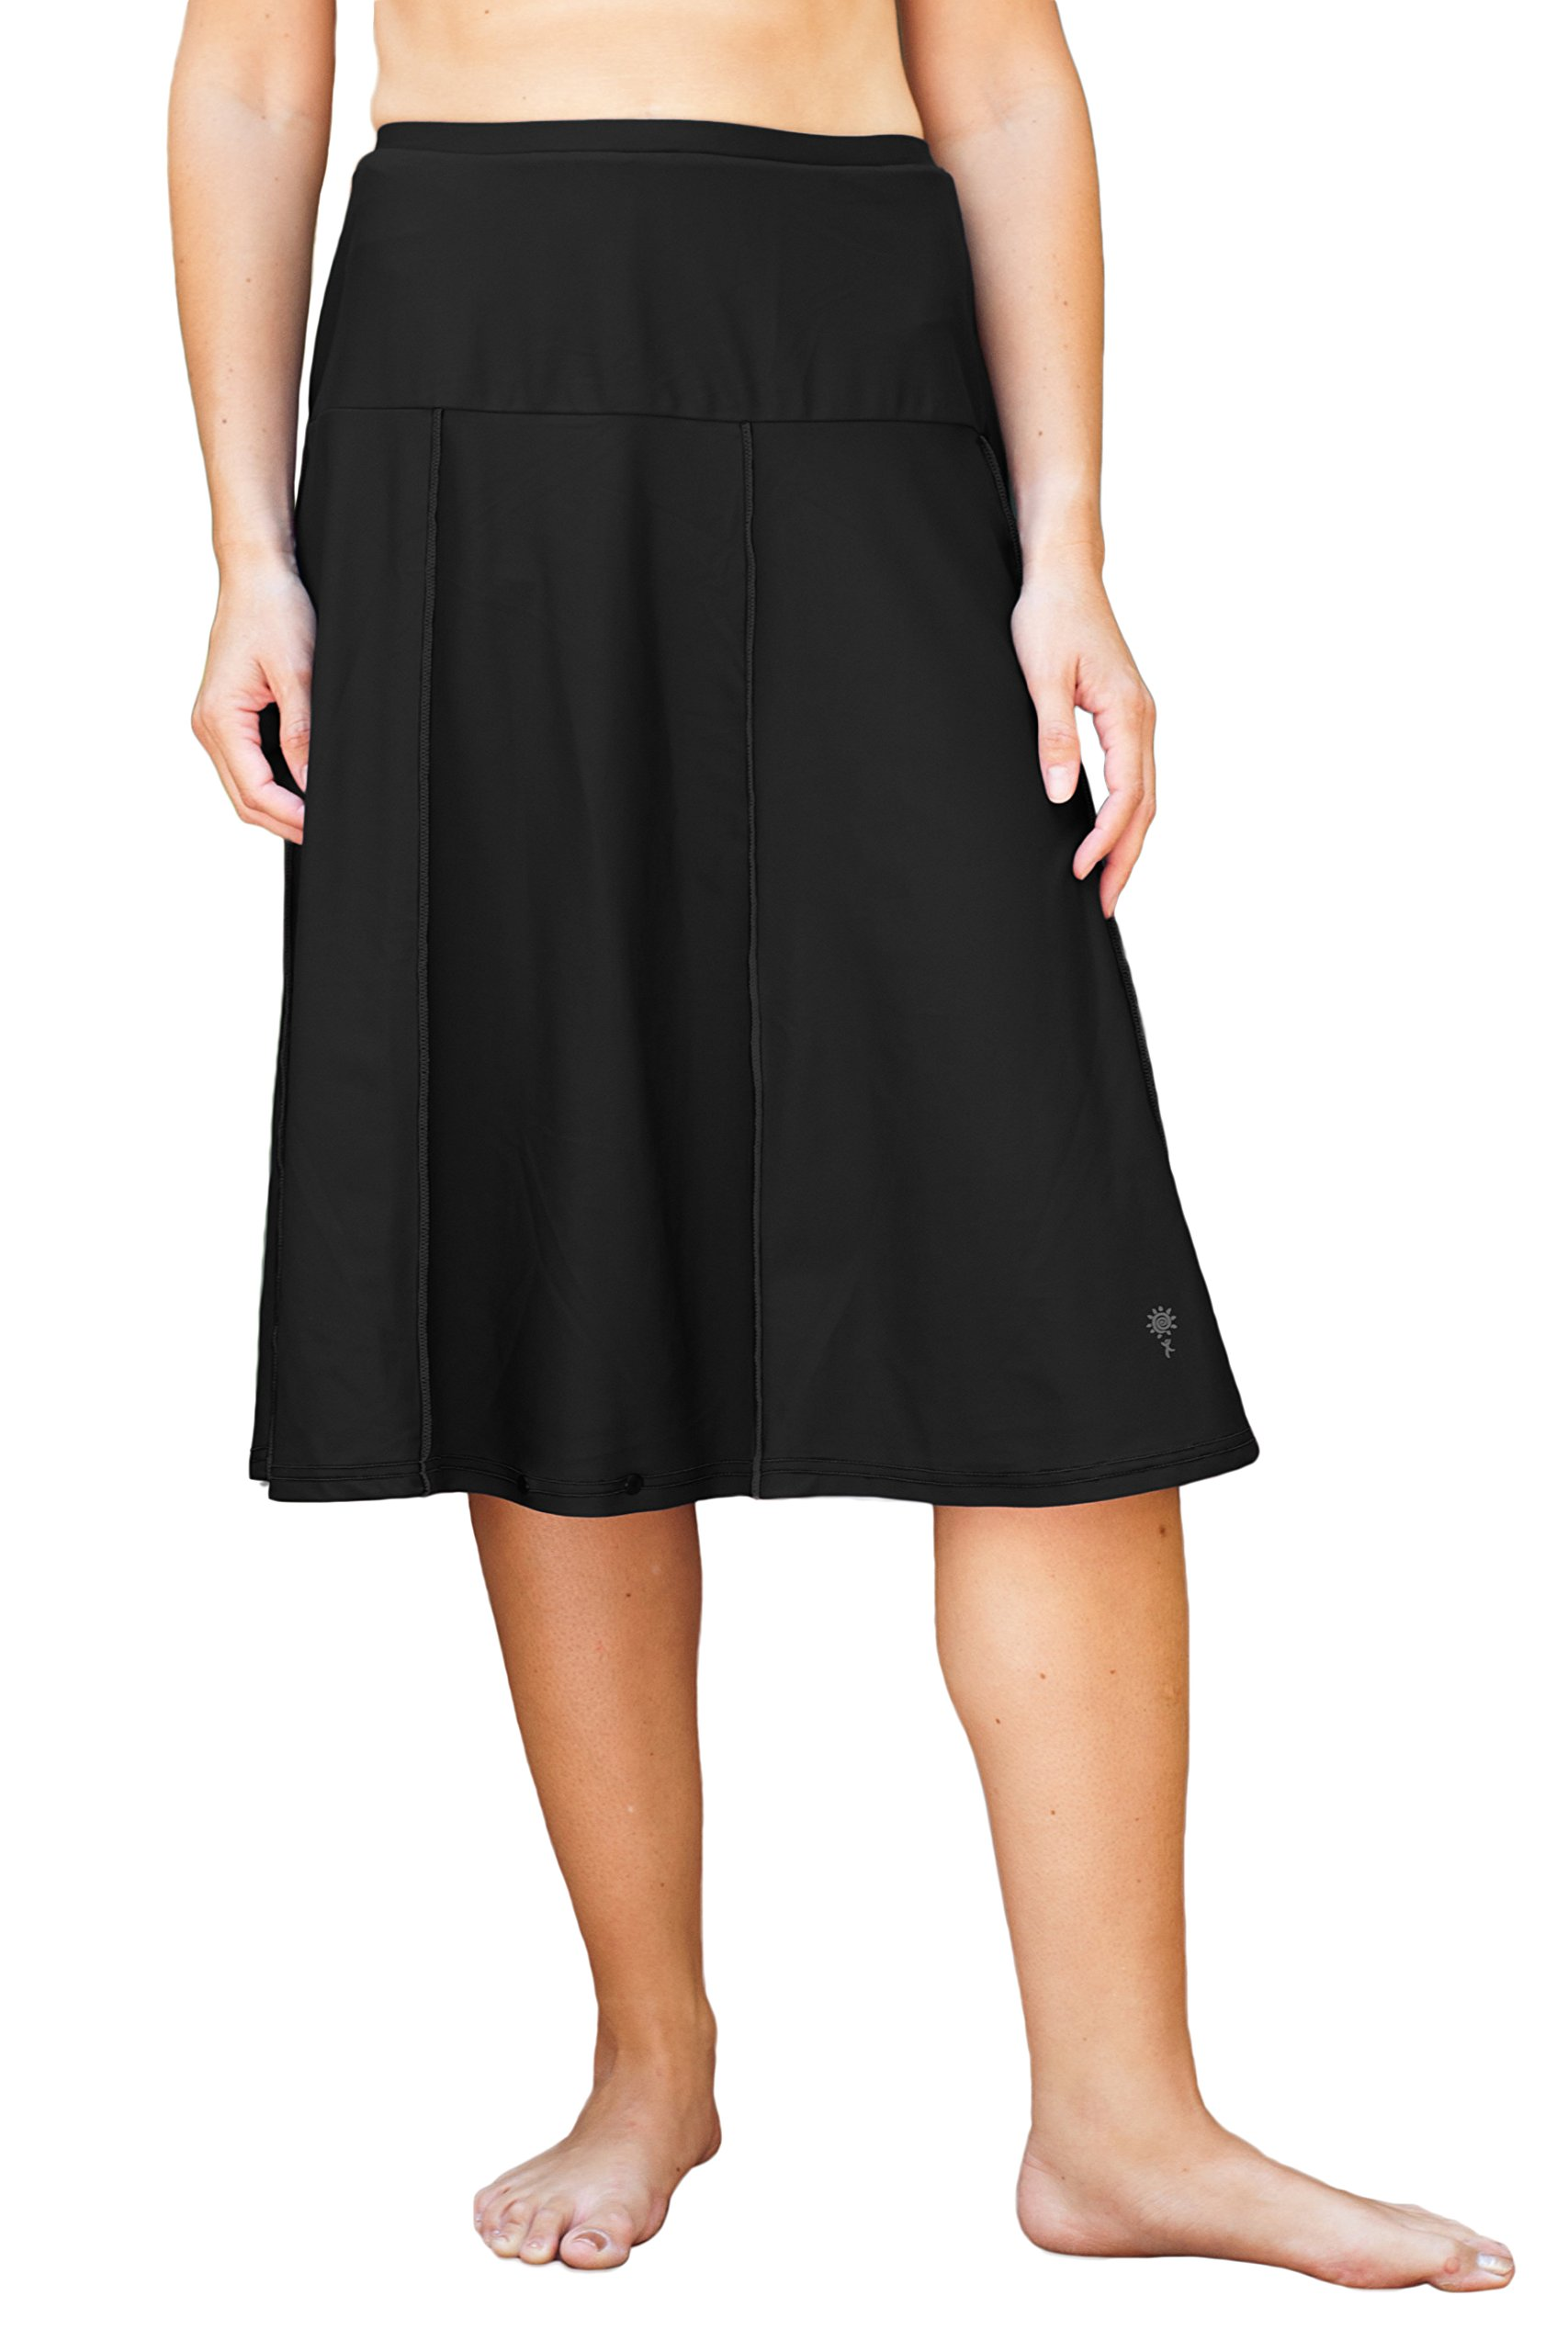 HydroChic Women's Plus Size Modest Extra Long Swim Skirt, Skirted Swimwear With Leggings (Black, 3X Plus)